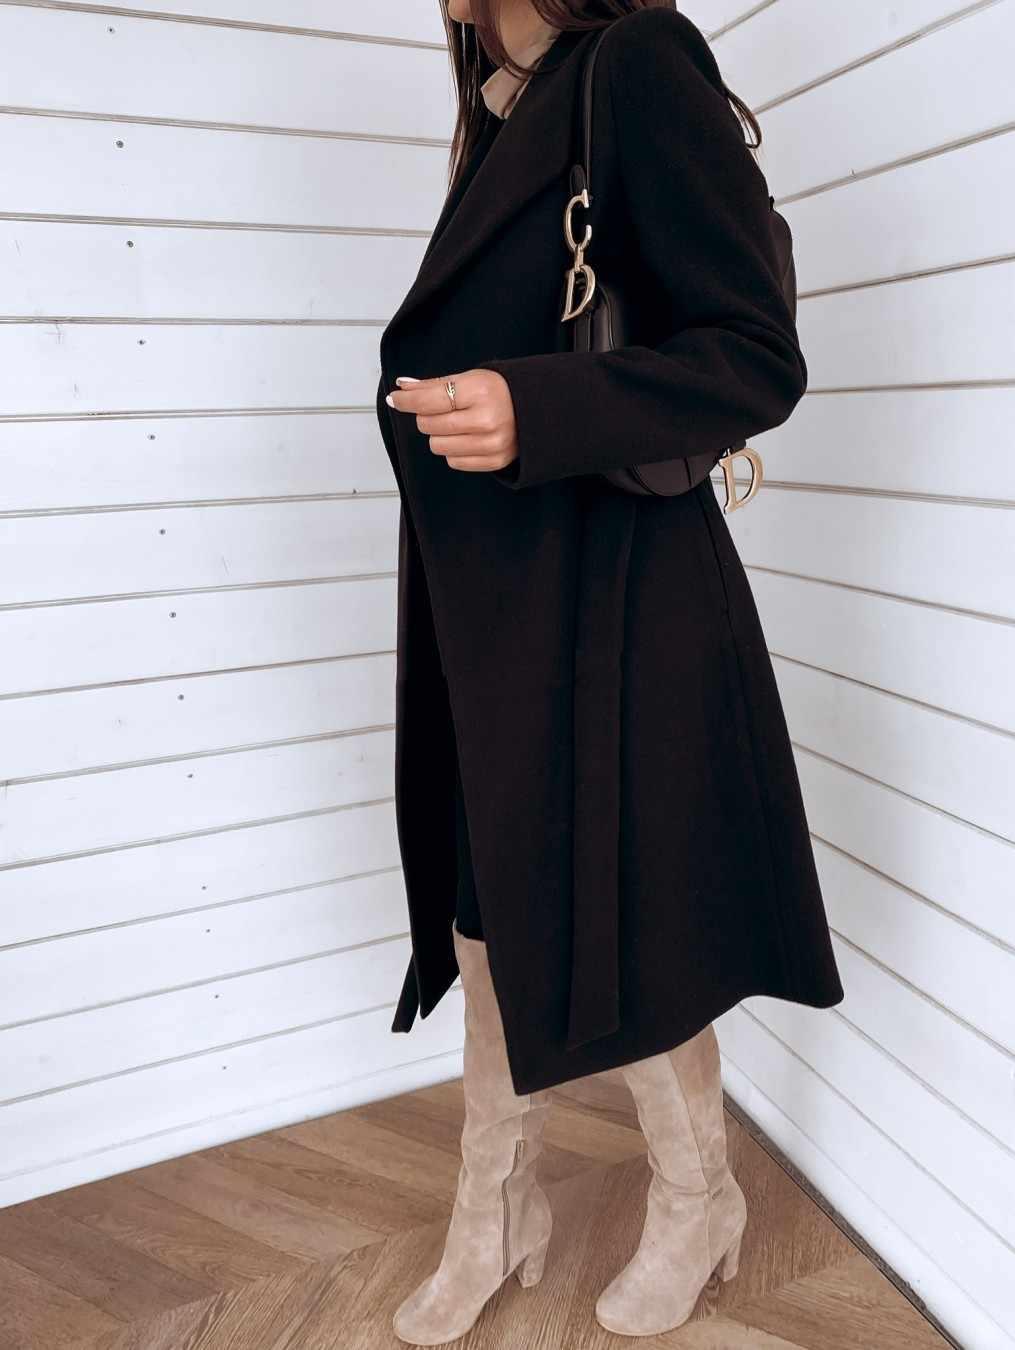 Women Long Sleeve Jacket Coat Hairy Open Elegant Front Short Korean Cardigan Suit Jacket Silm Solid Long Coat Jacket #112